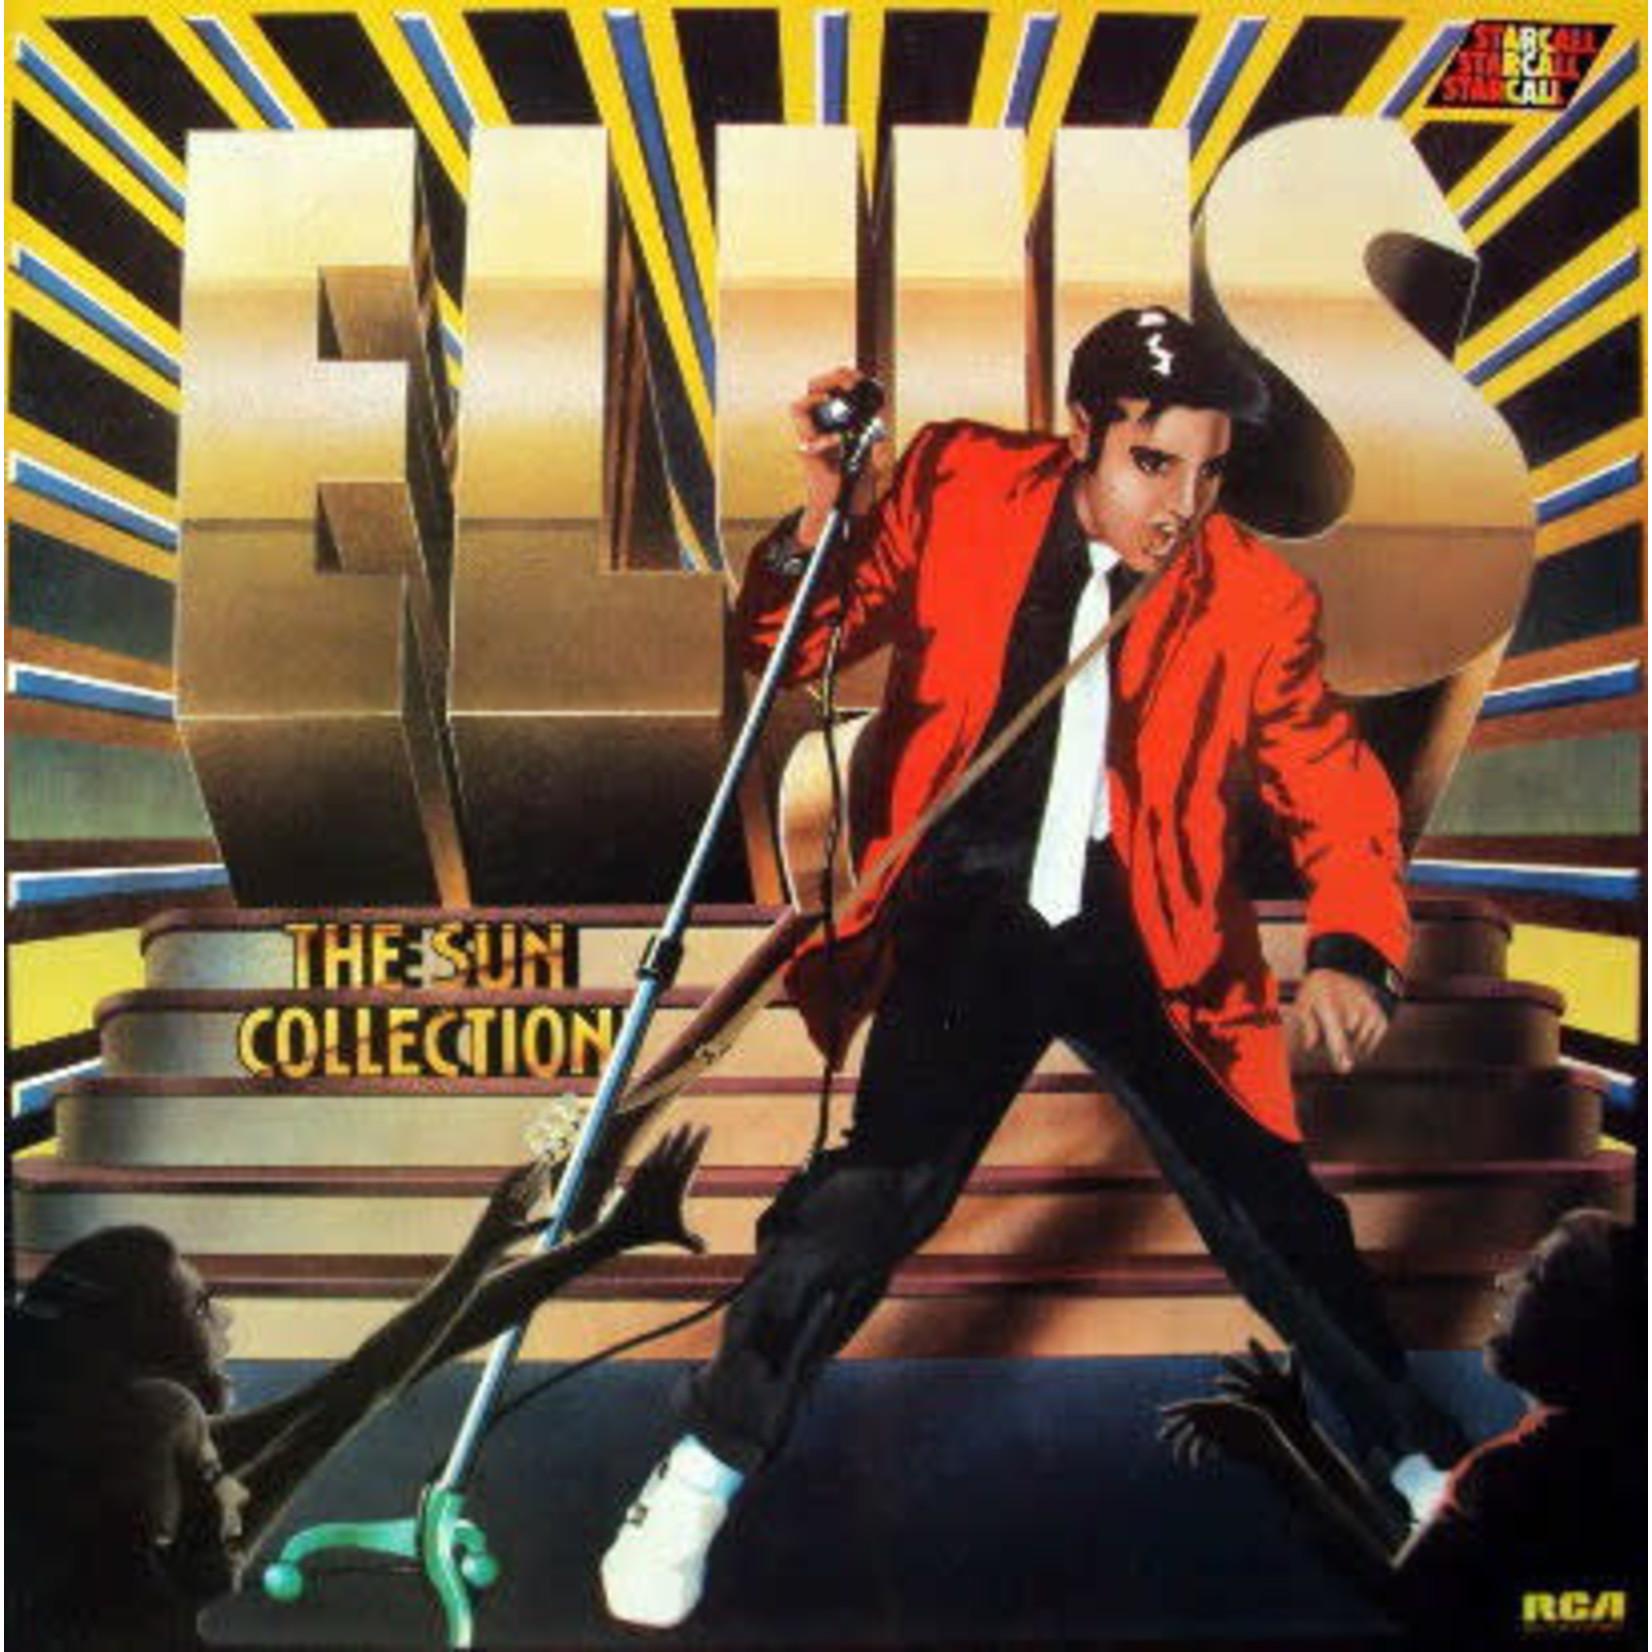 [Vintage] Presley, Elvis: The Sun Collection (RCA)